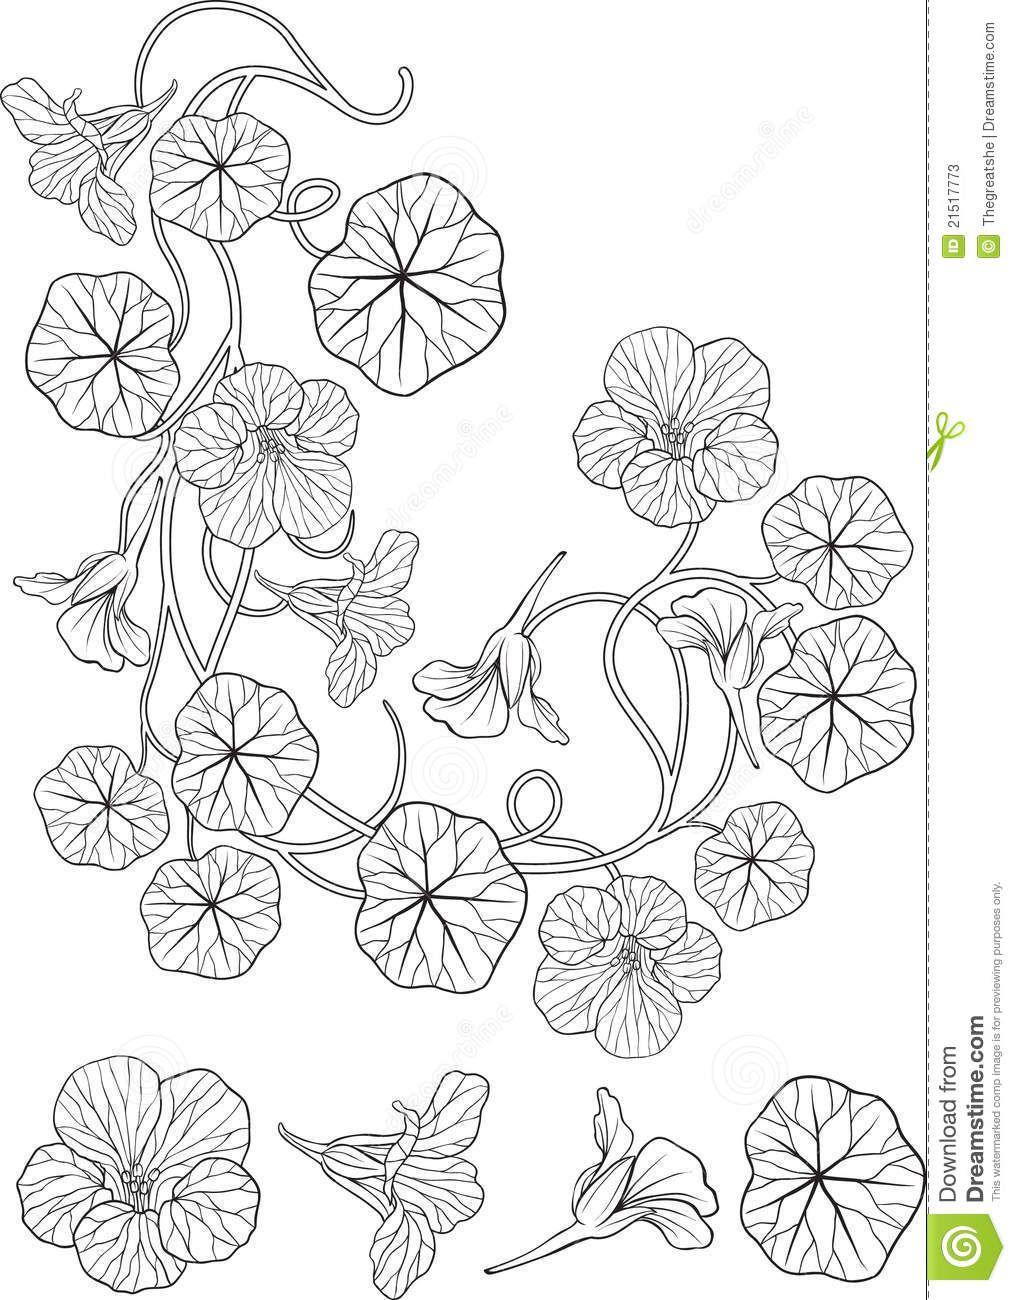 Art Nouveau Flower Tattoo Gis: Nasturtium Flower Art Nouveau Style Tattoo Stock Photos